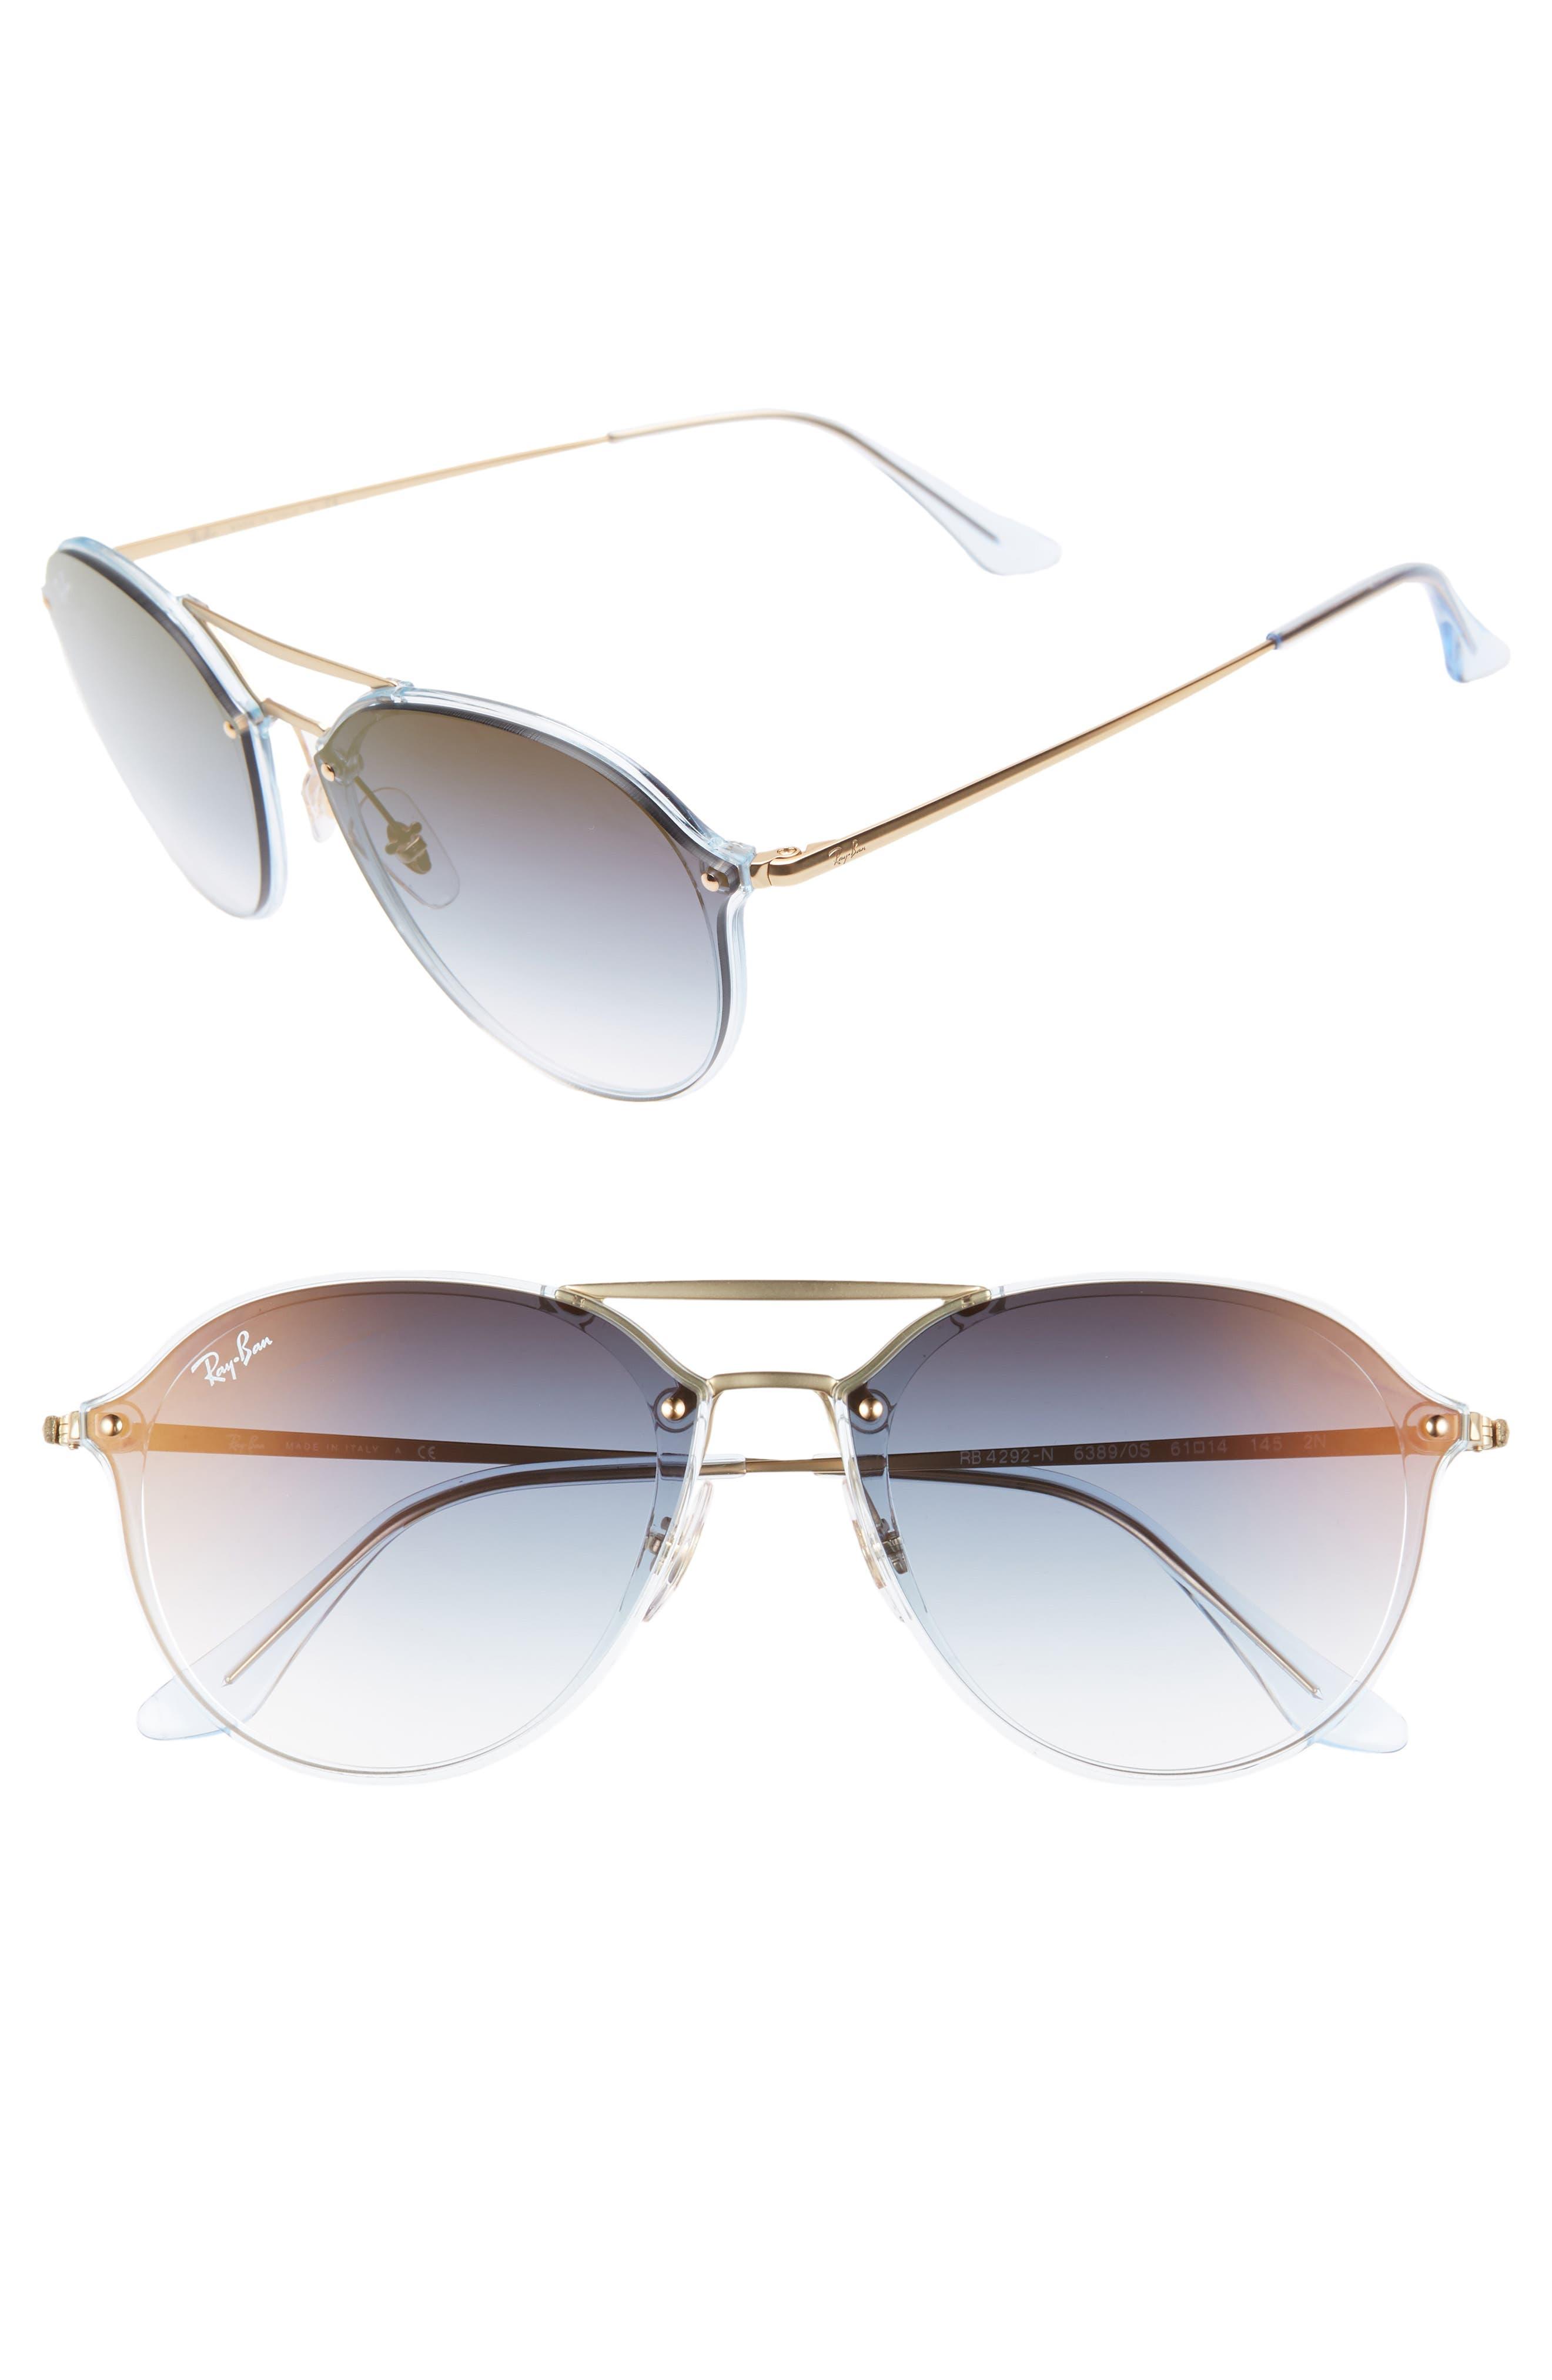 Ray-Ban 61Mm Gradient Aviator Sunglasses - Gold/ Grey Gradient